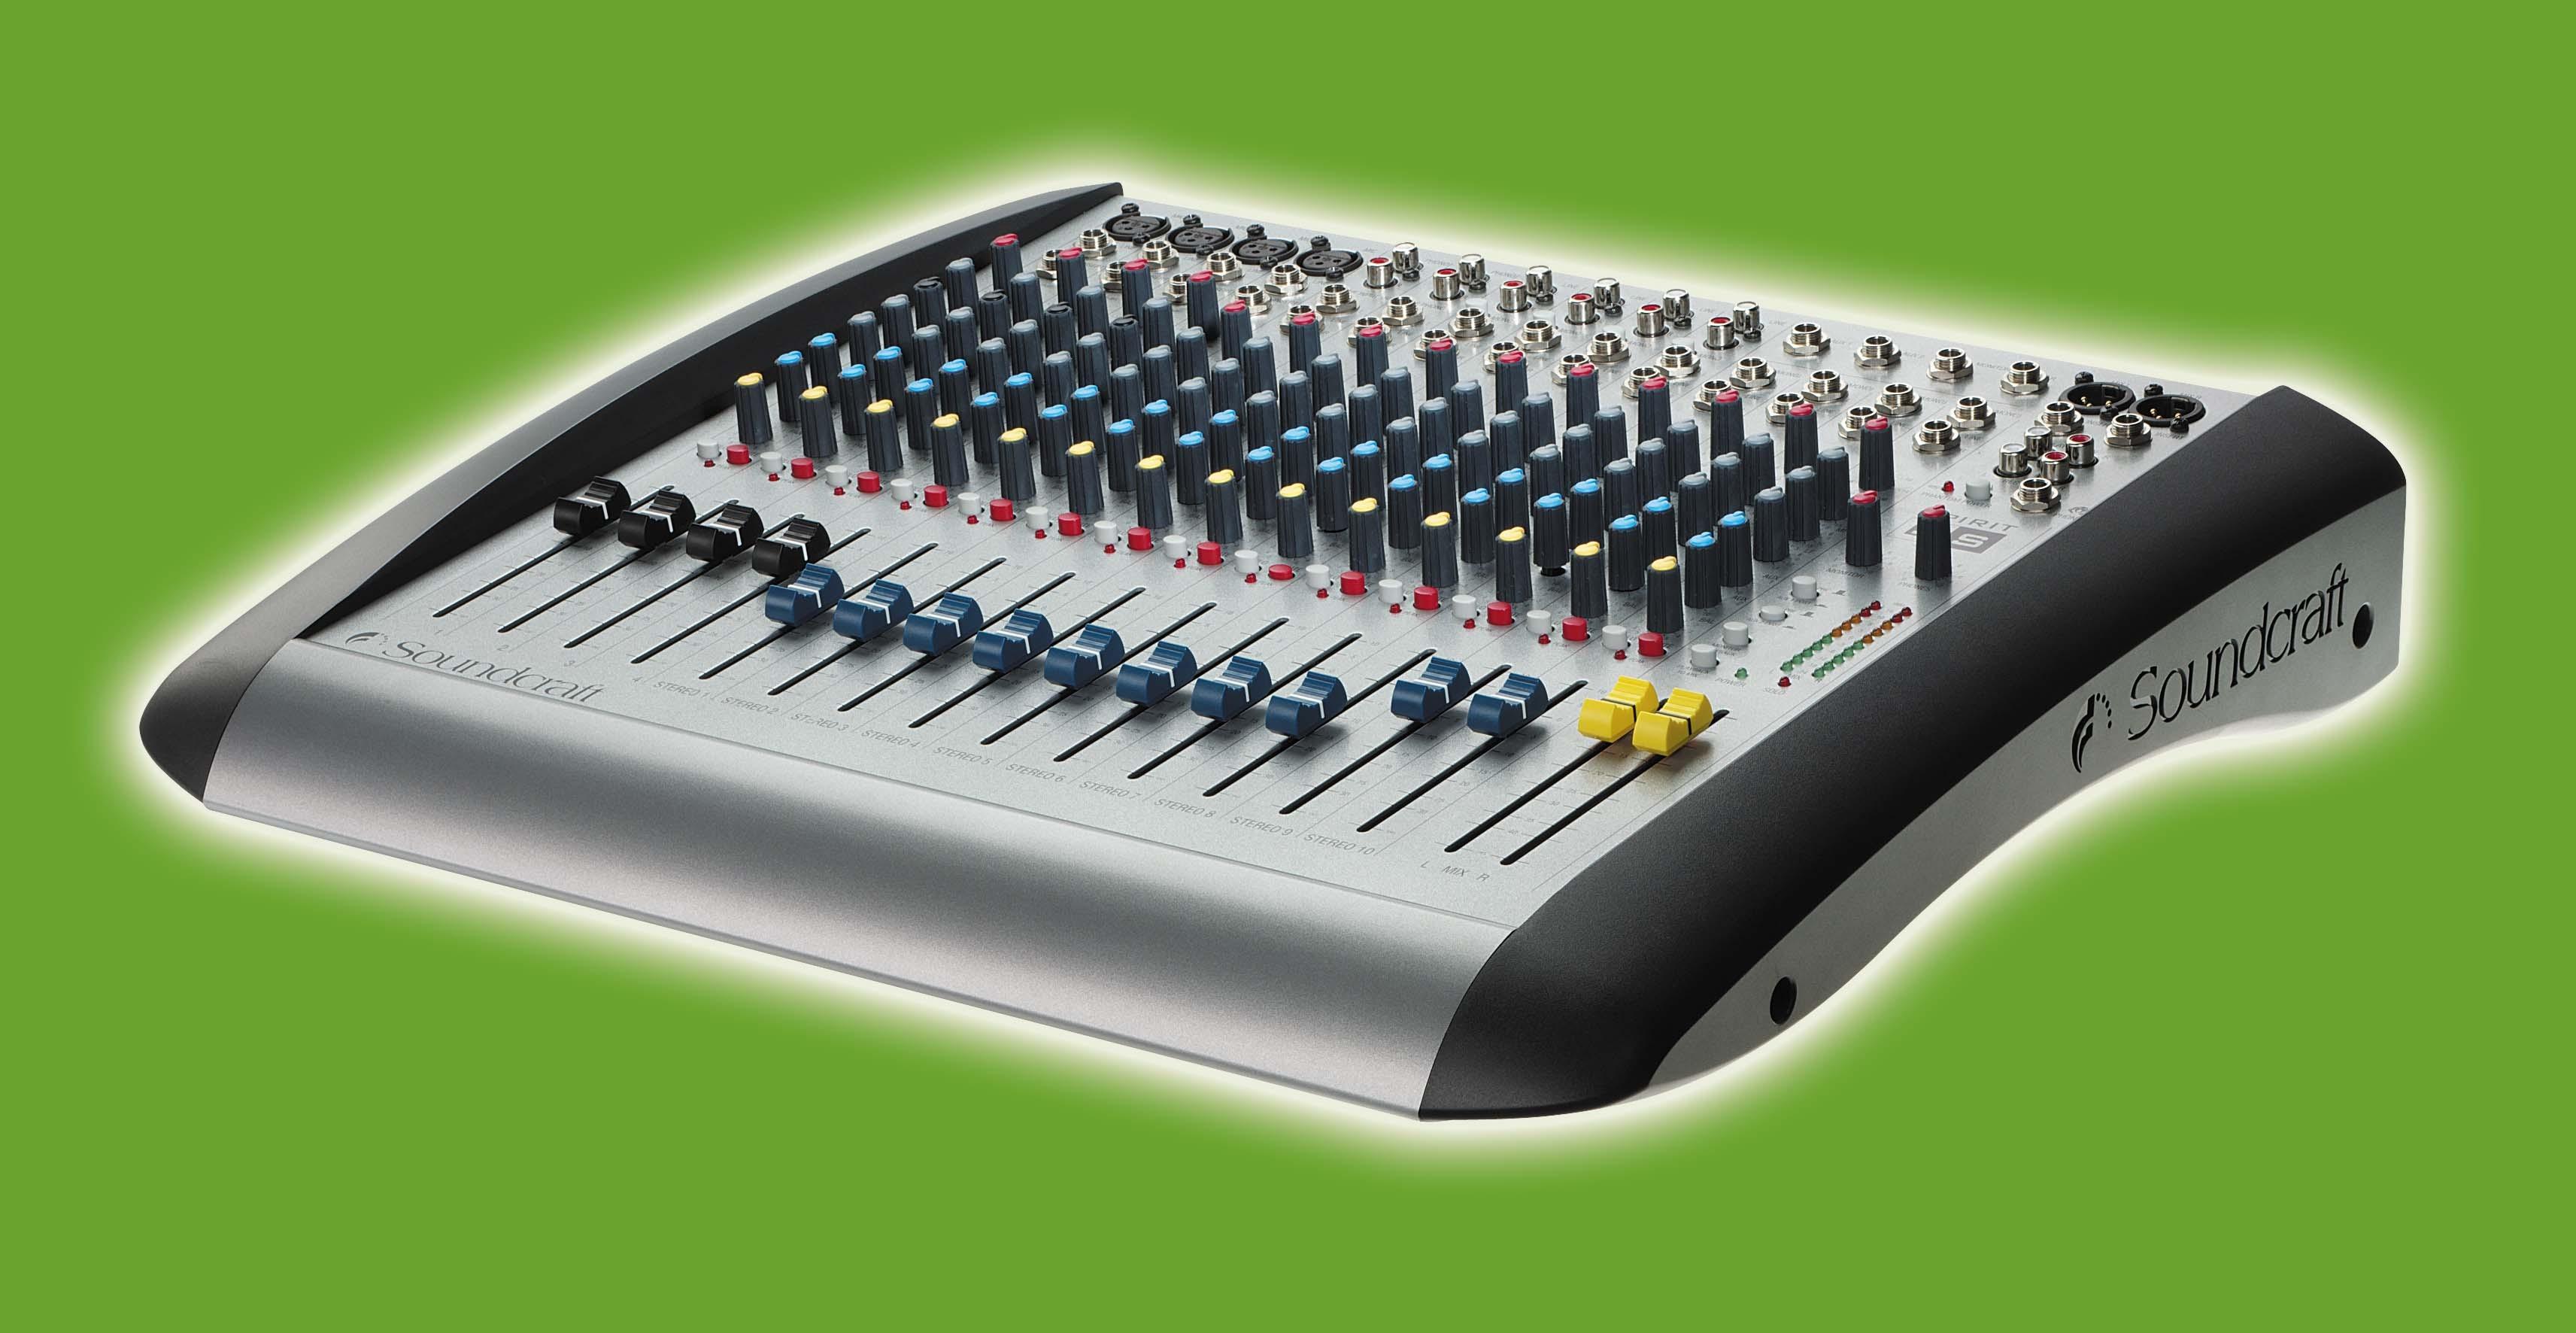 spirit e series soundcraft professional audio mixers rh soundcraft com Live with Randy California Spirit Visions of Spirits Live